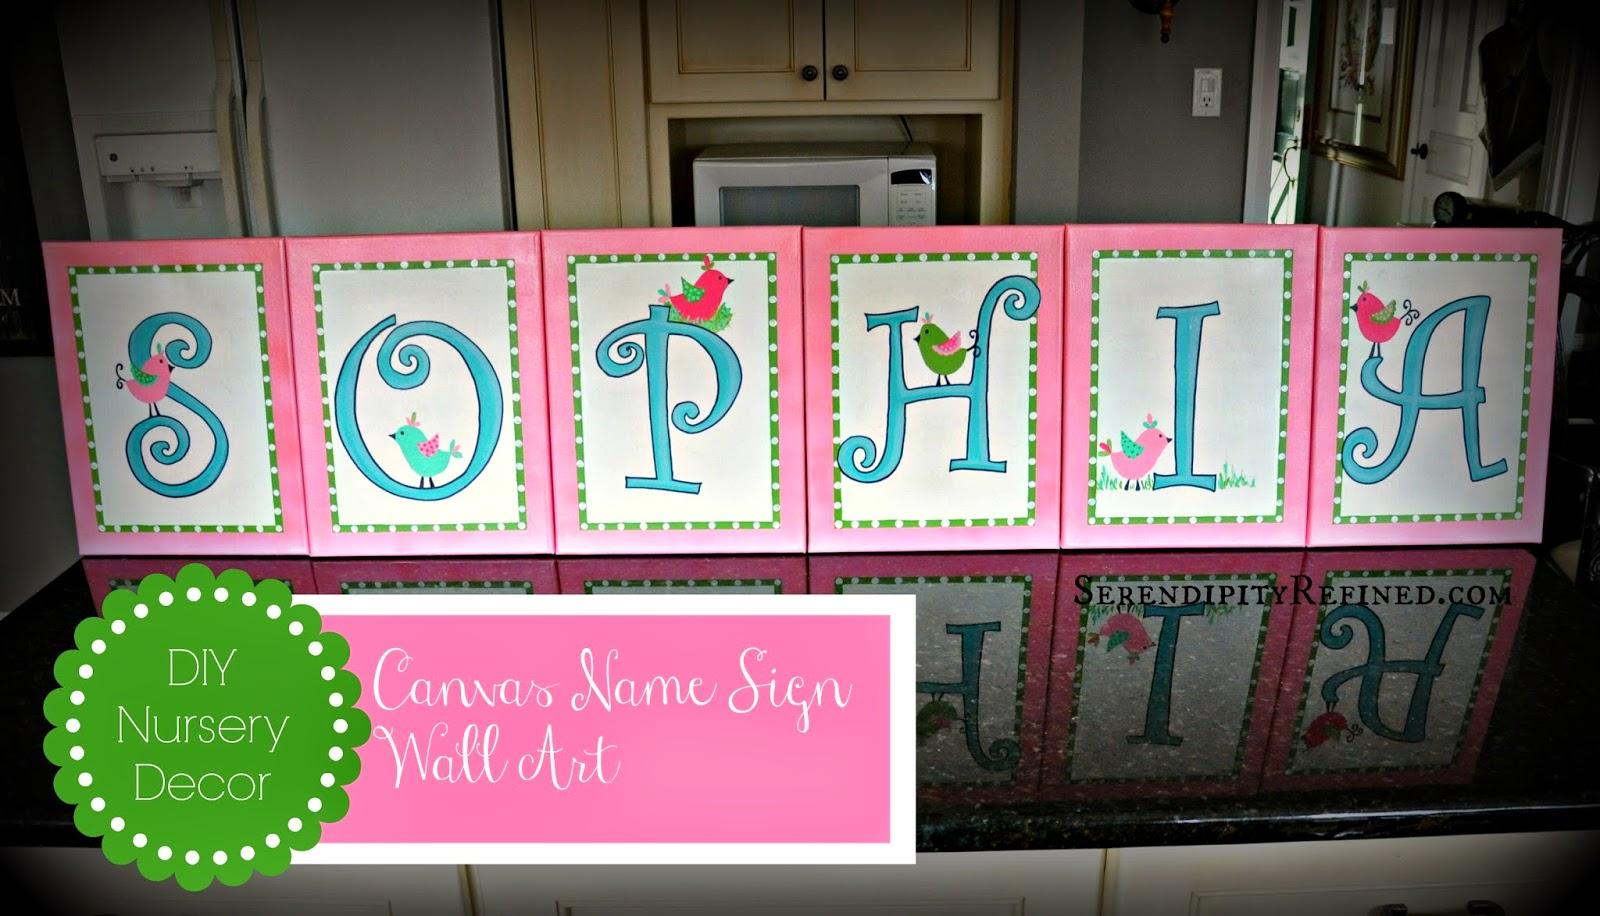 Serendipity Refined Blog: DIY Canvas Name Sign Nursery ...